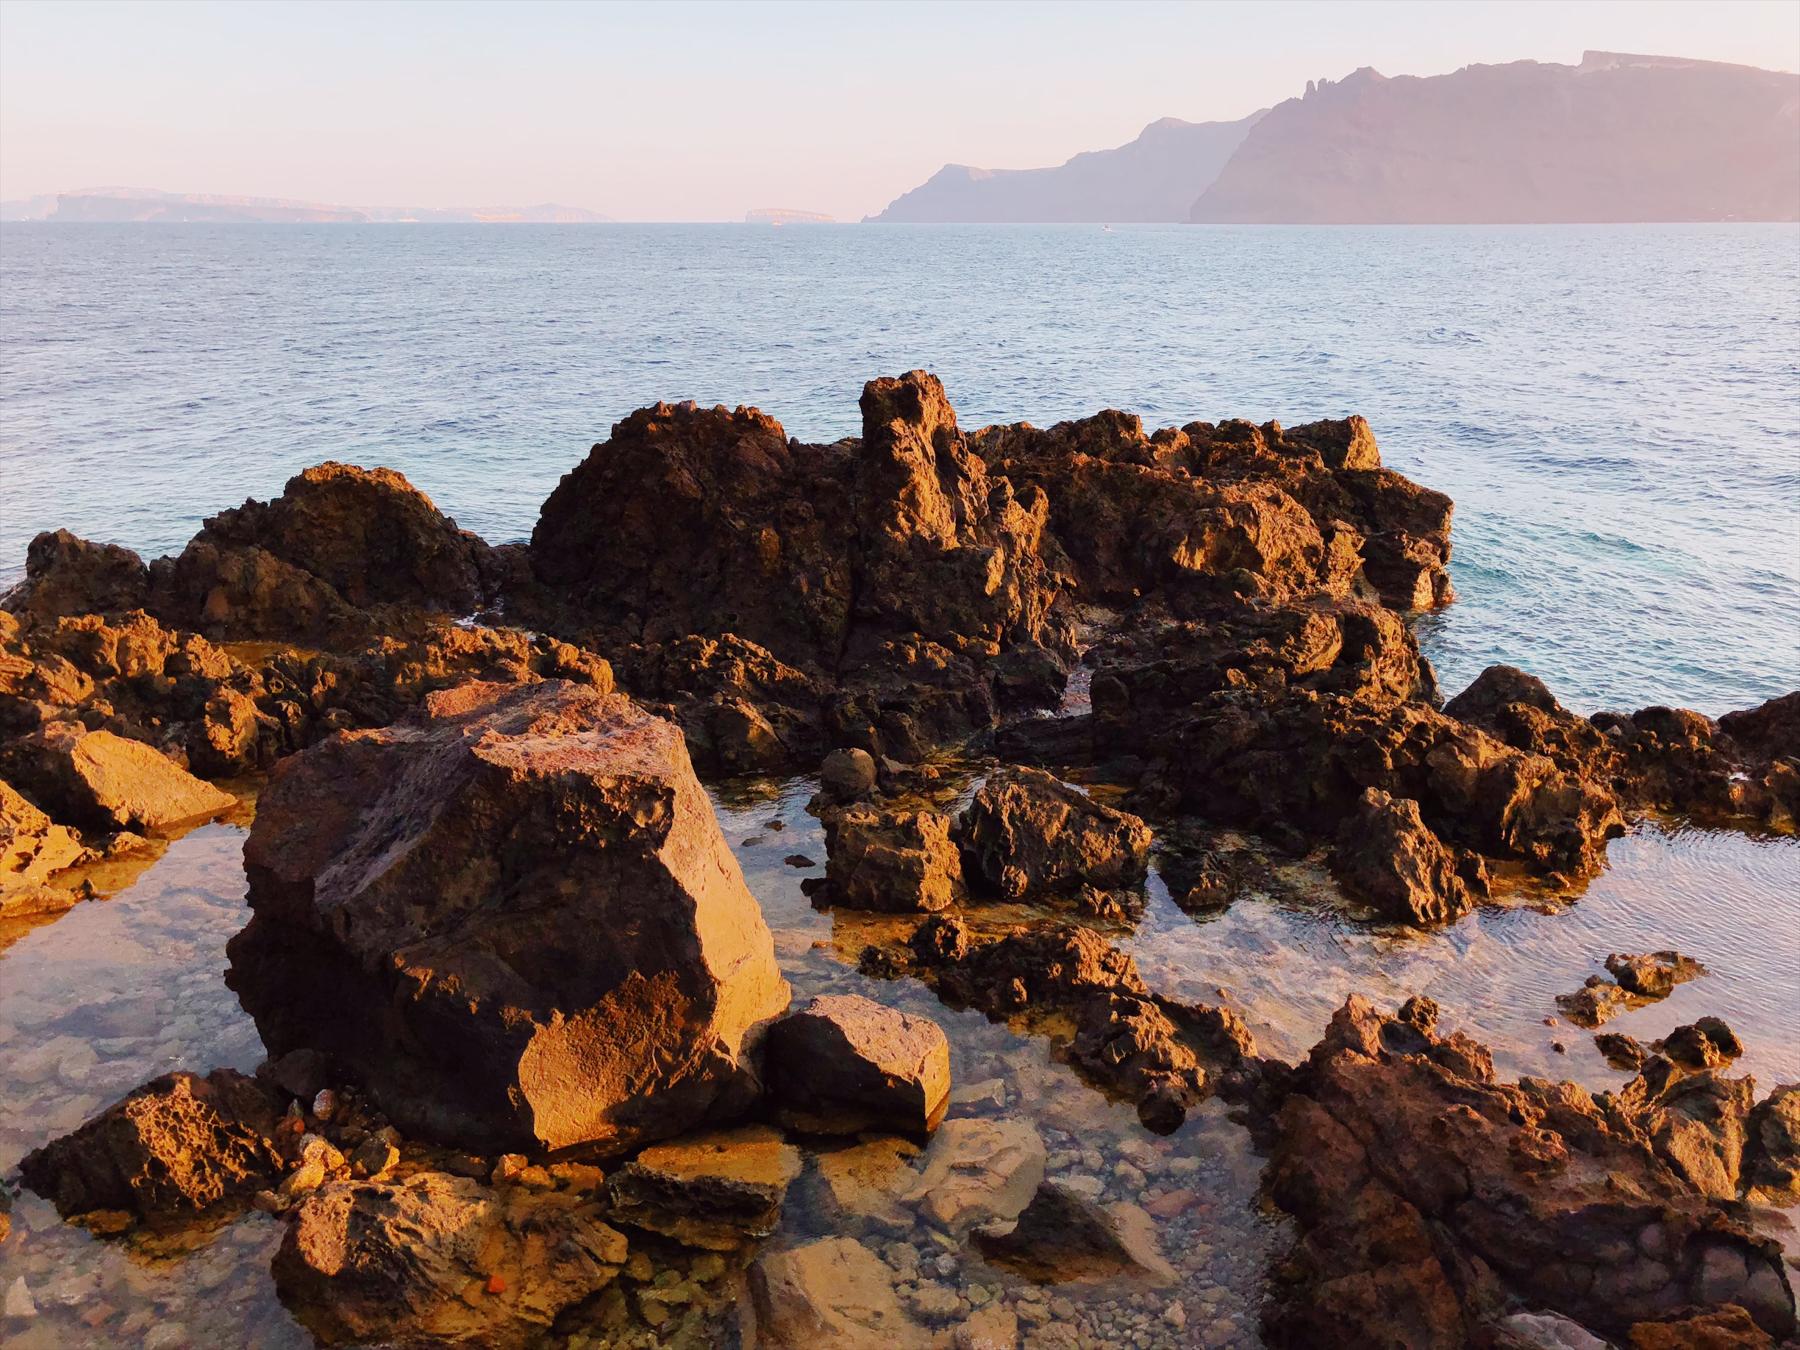 Exploring the coast around Amoudi Bay